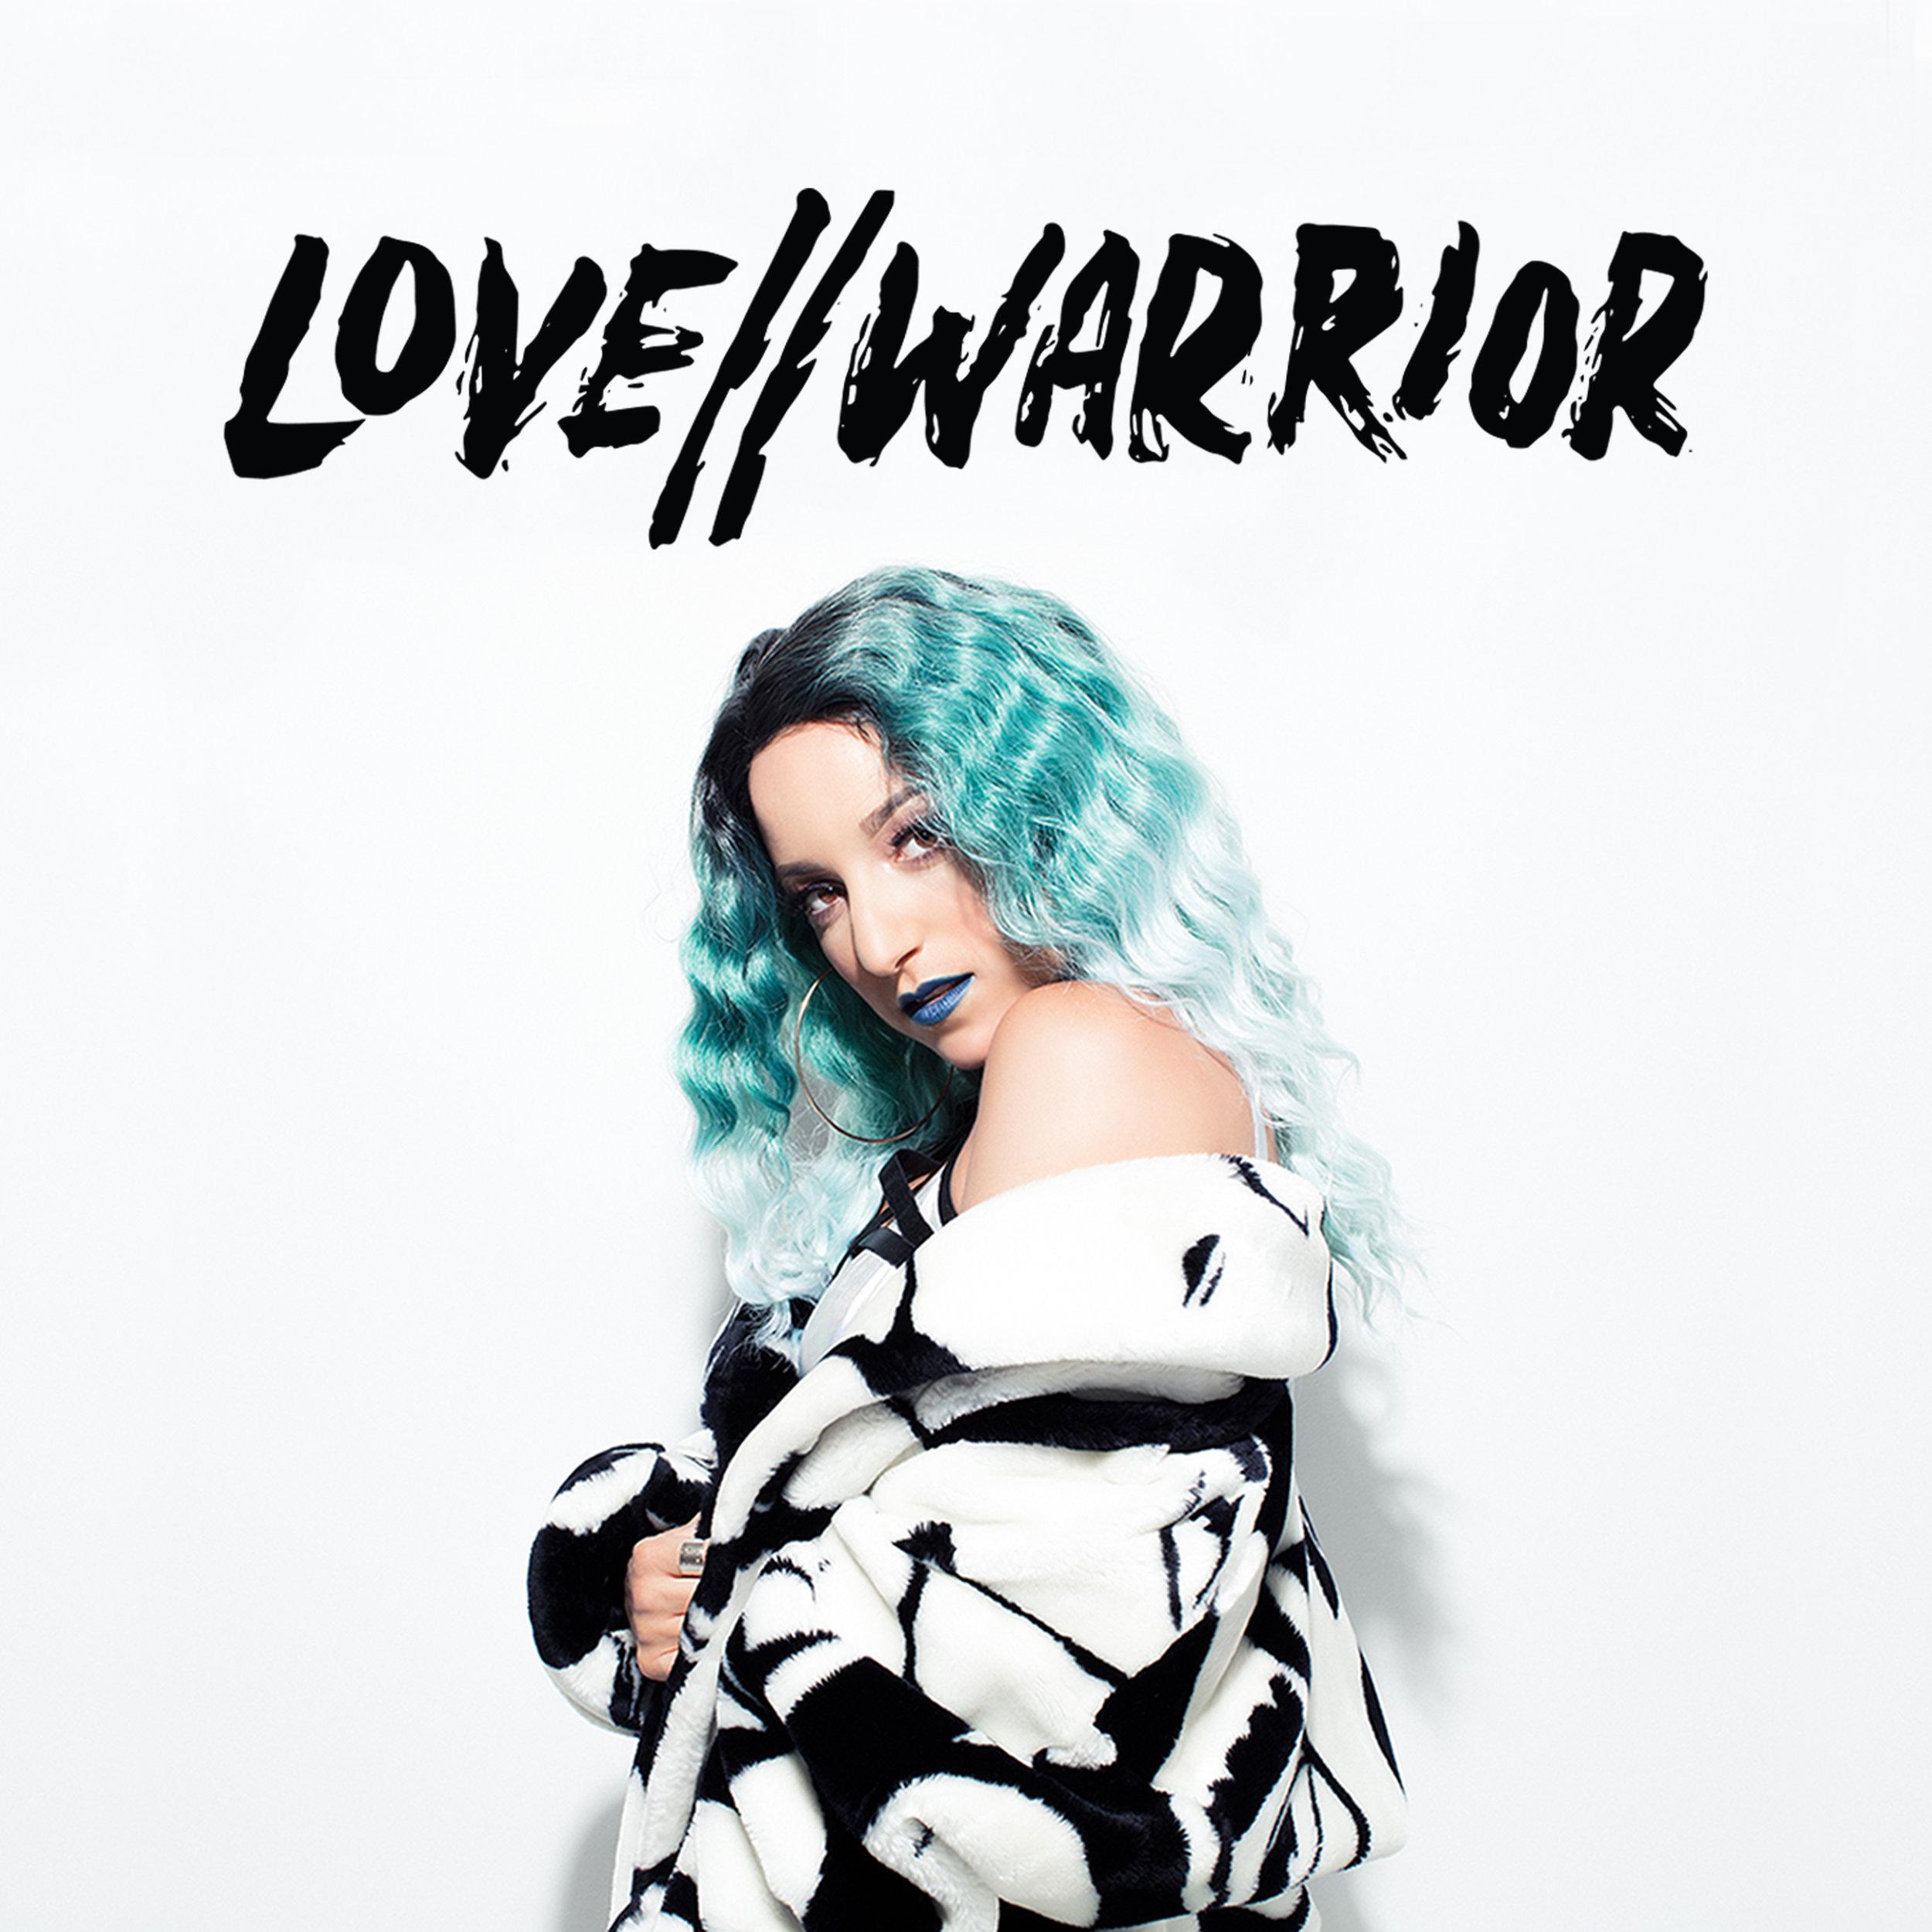 Frankie simone - LOVE//WARRIOR